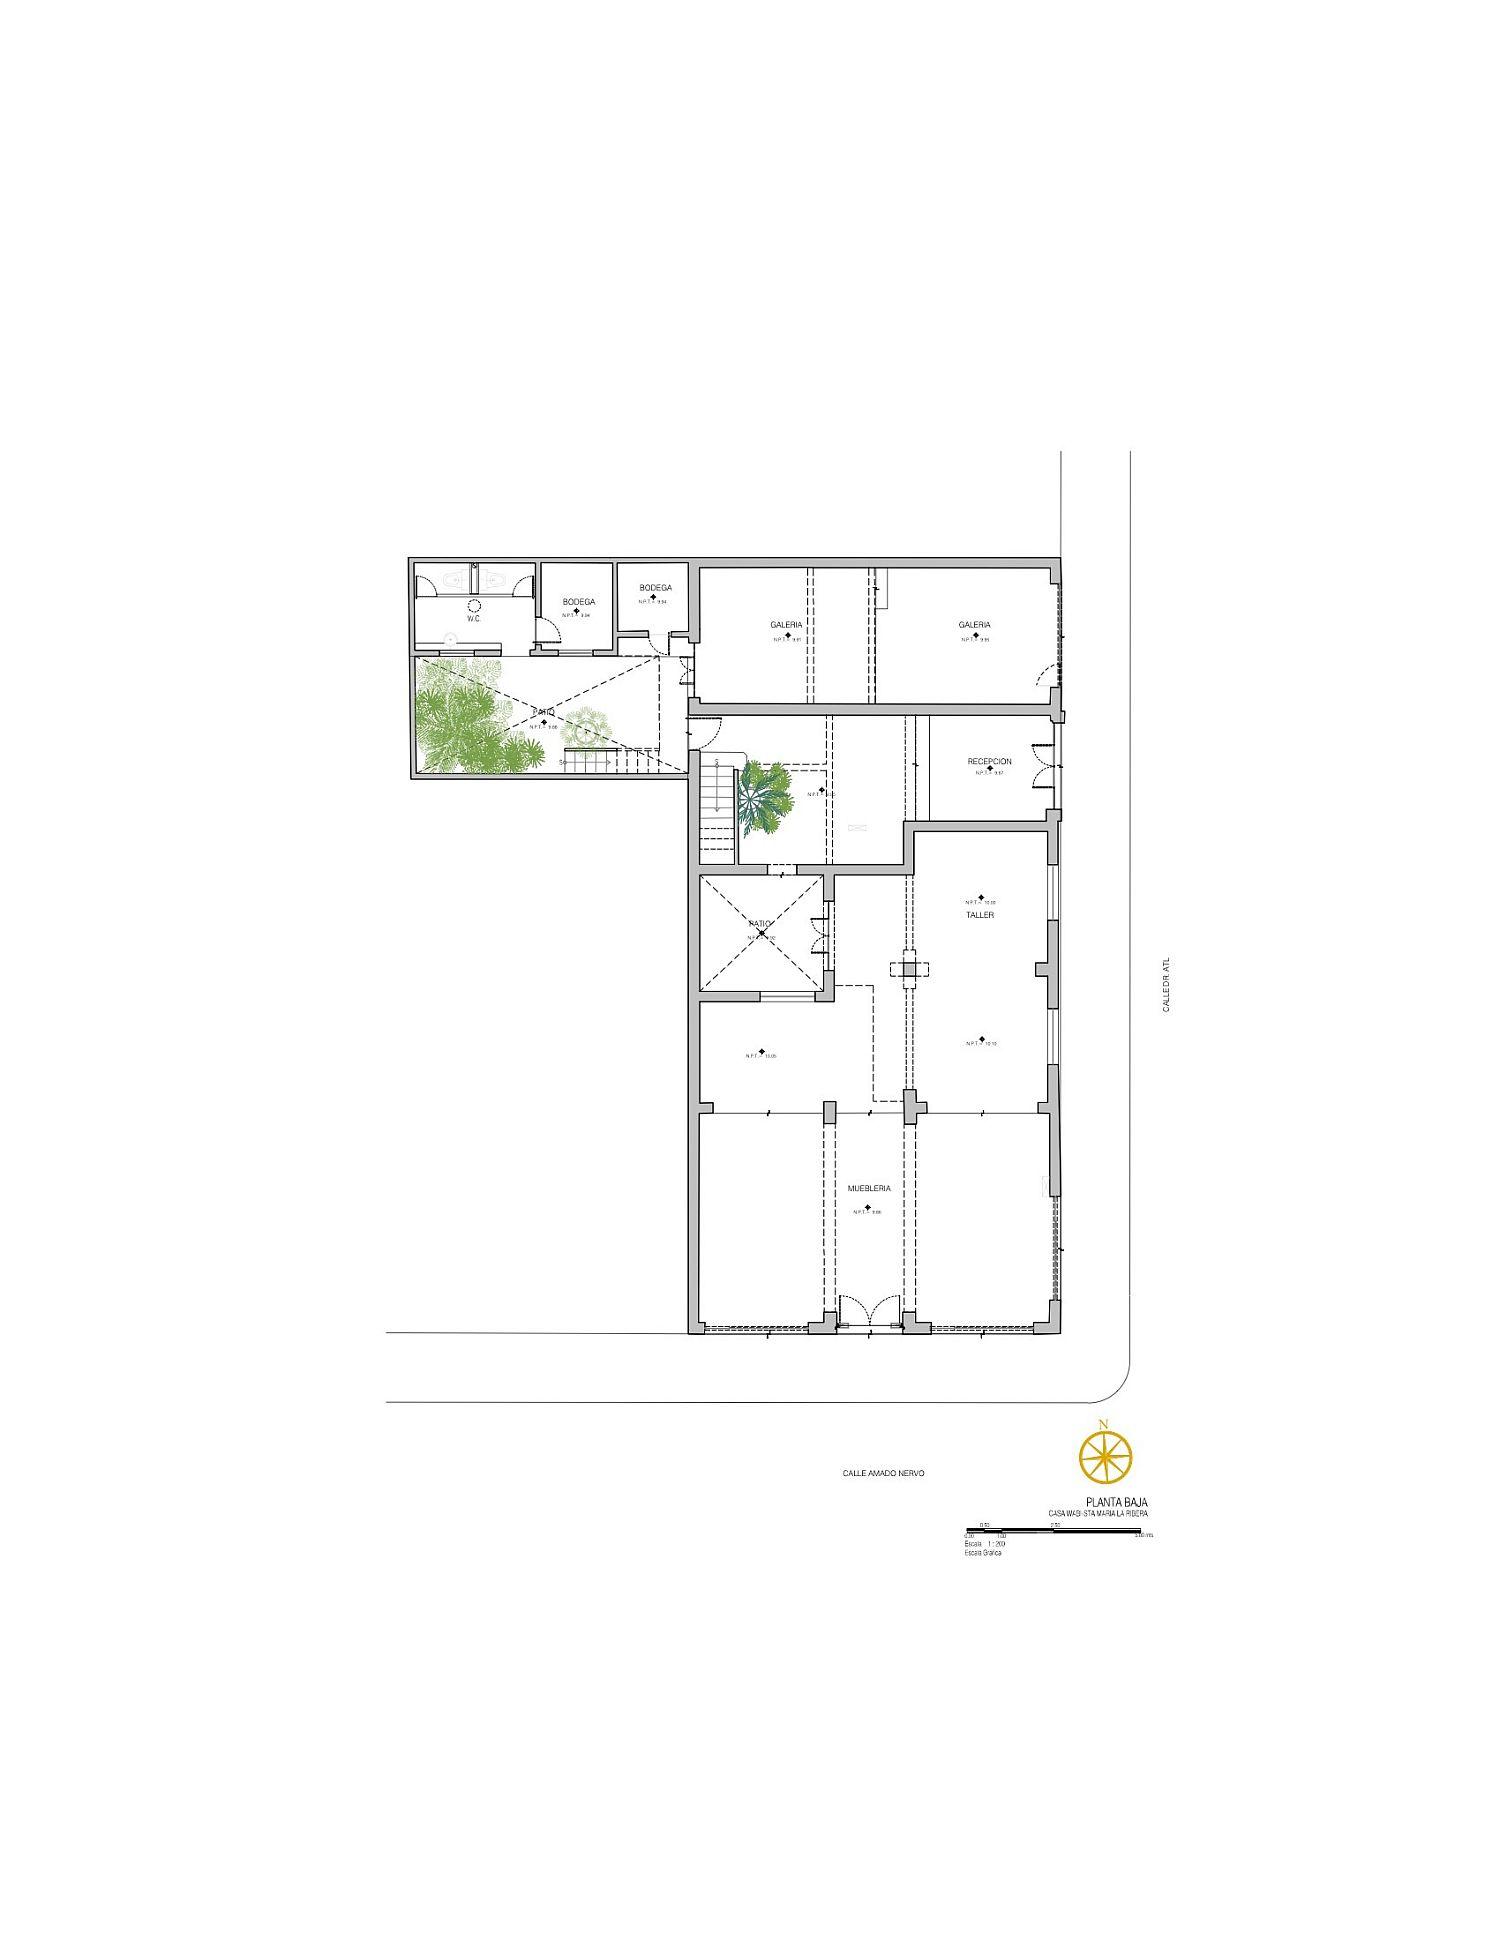 Lower level floor plan of Fundacion Casa Wabi Headquarters